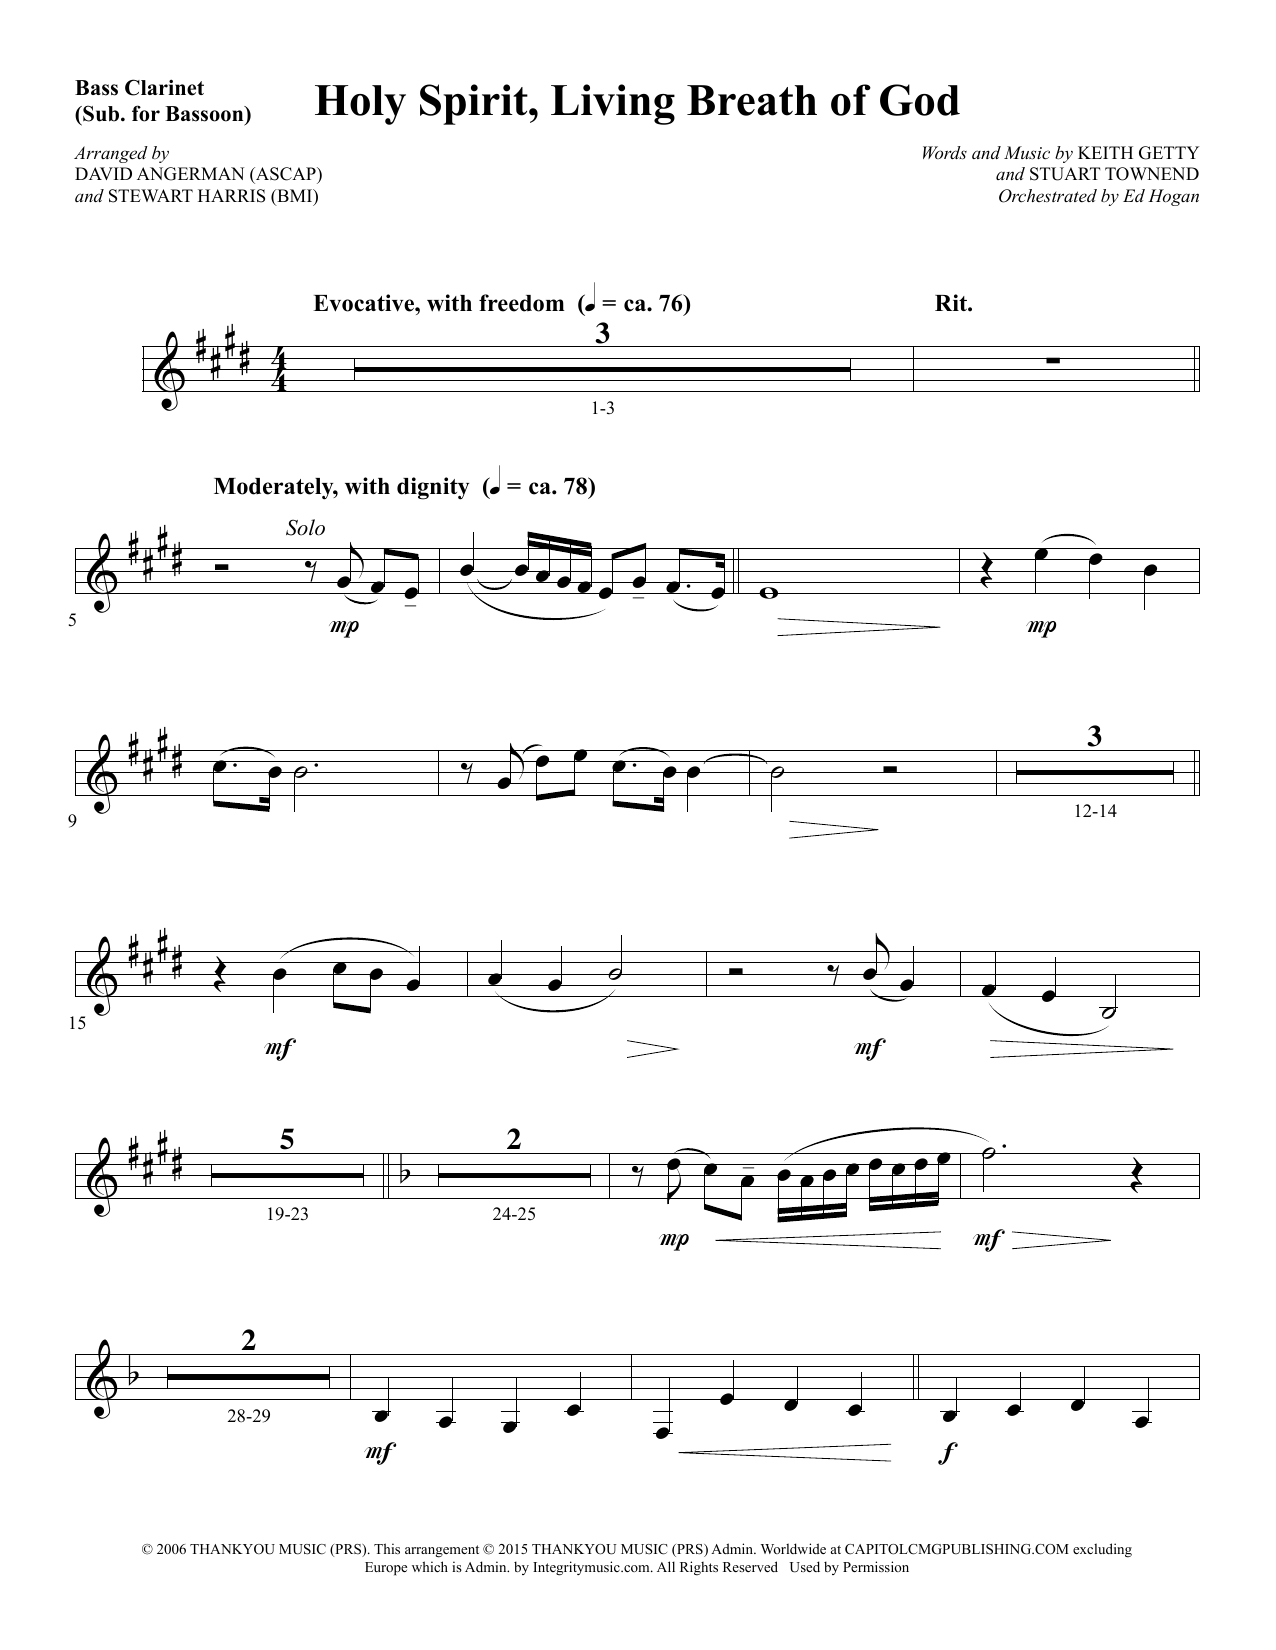 Holy Spirit, Living Breath of God - Bass Clarinet (sub. Bassoon) sheet music